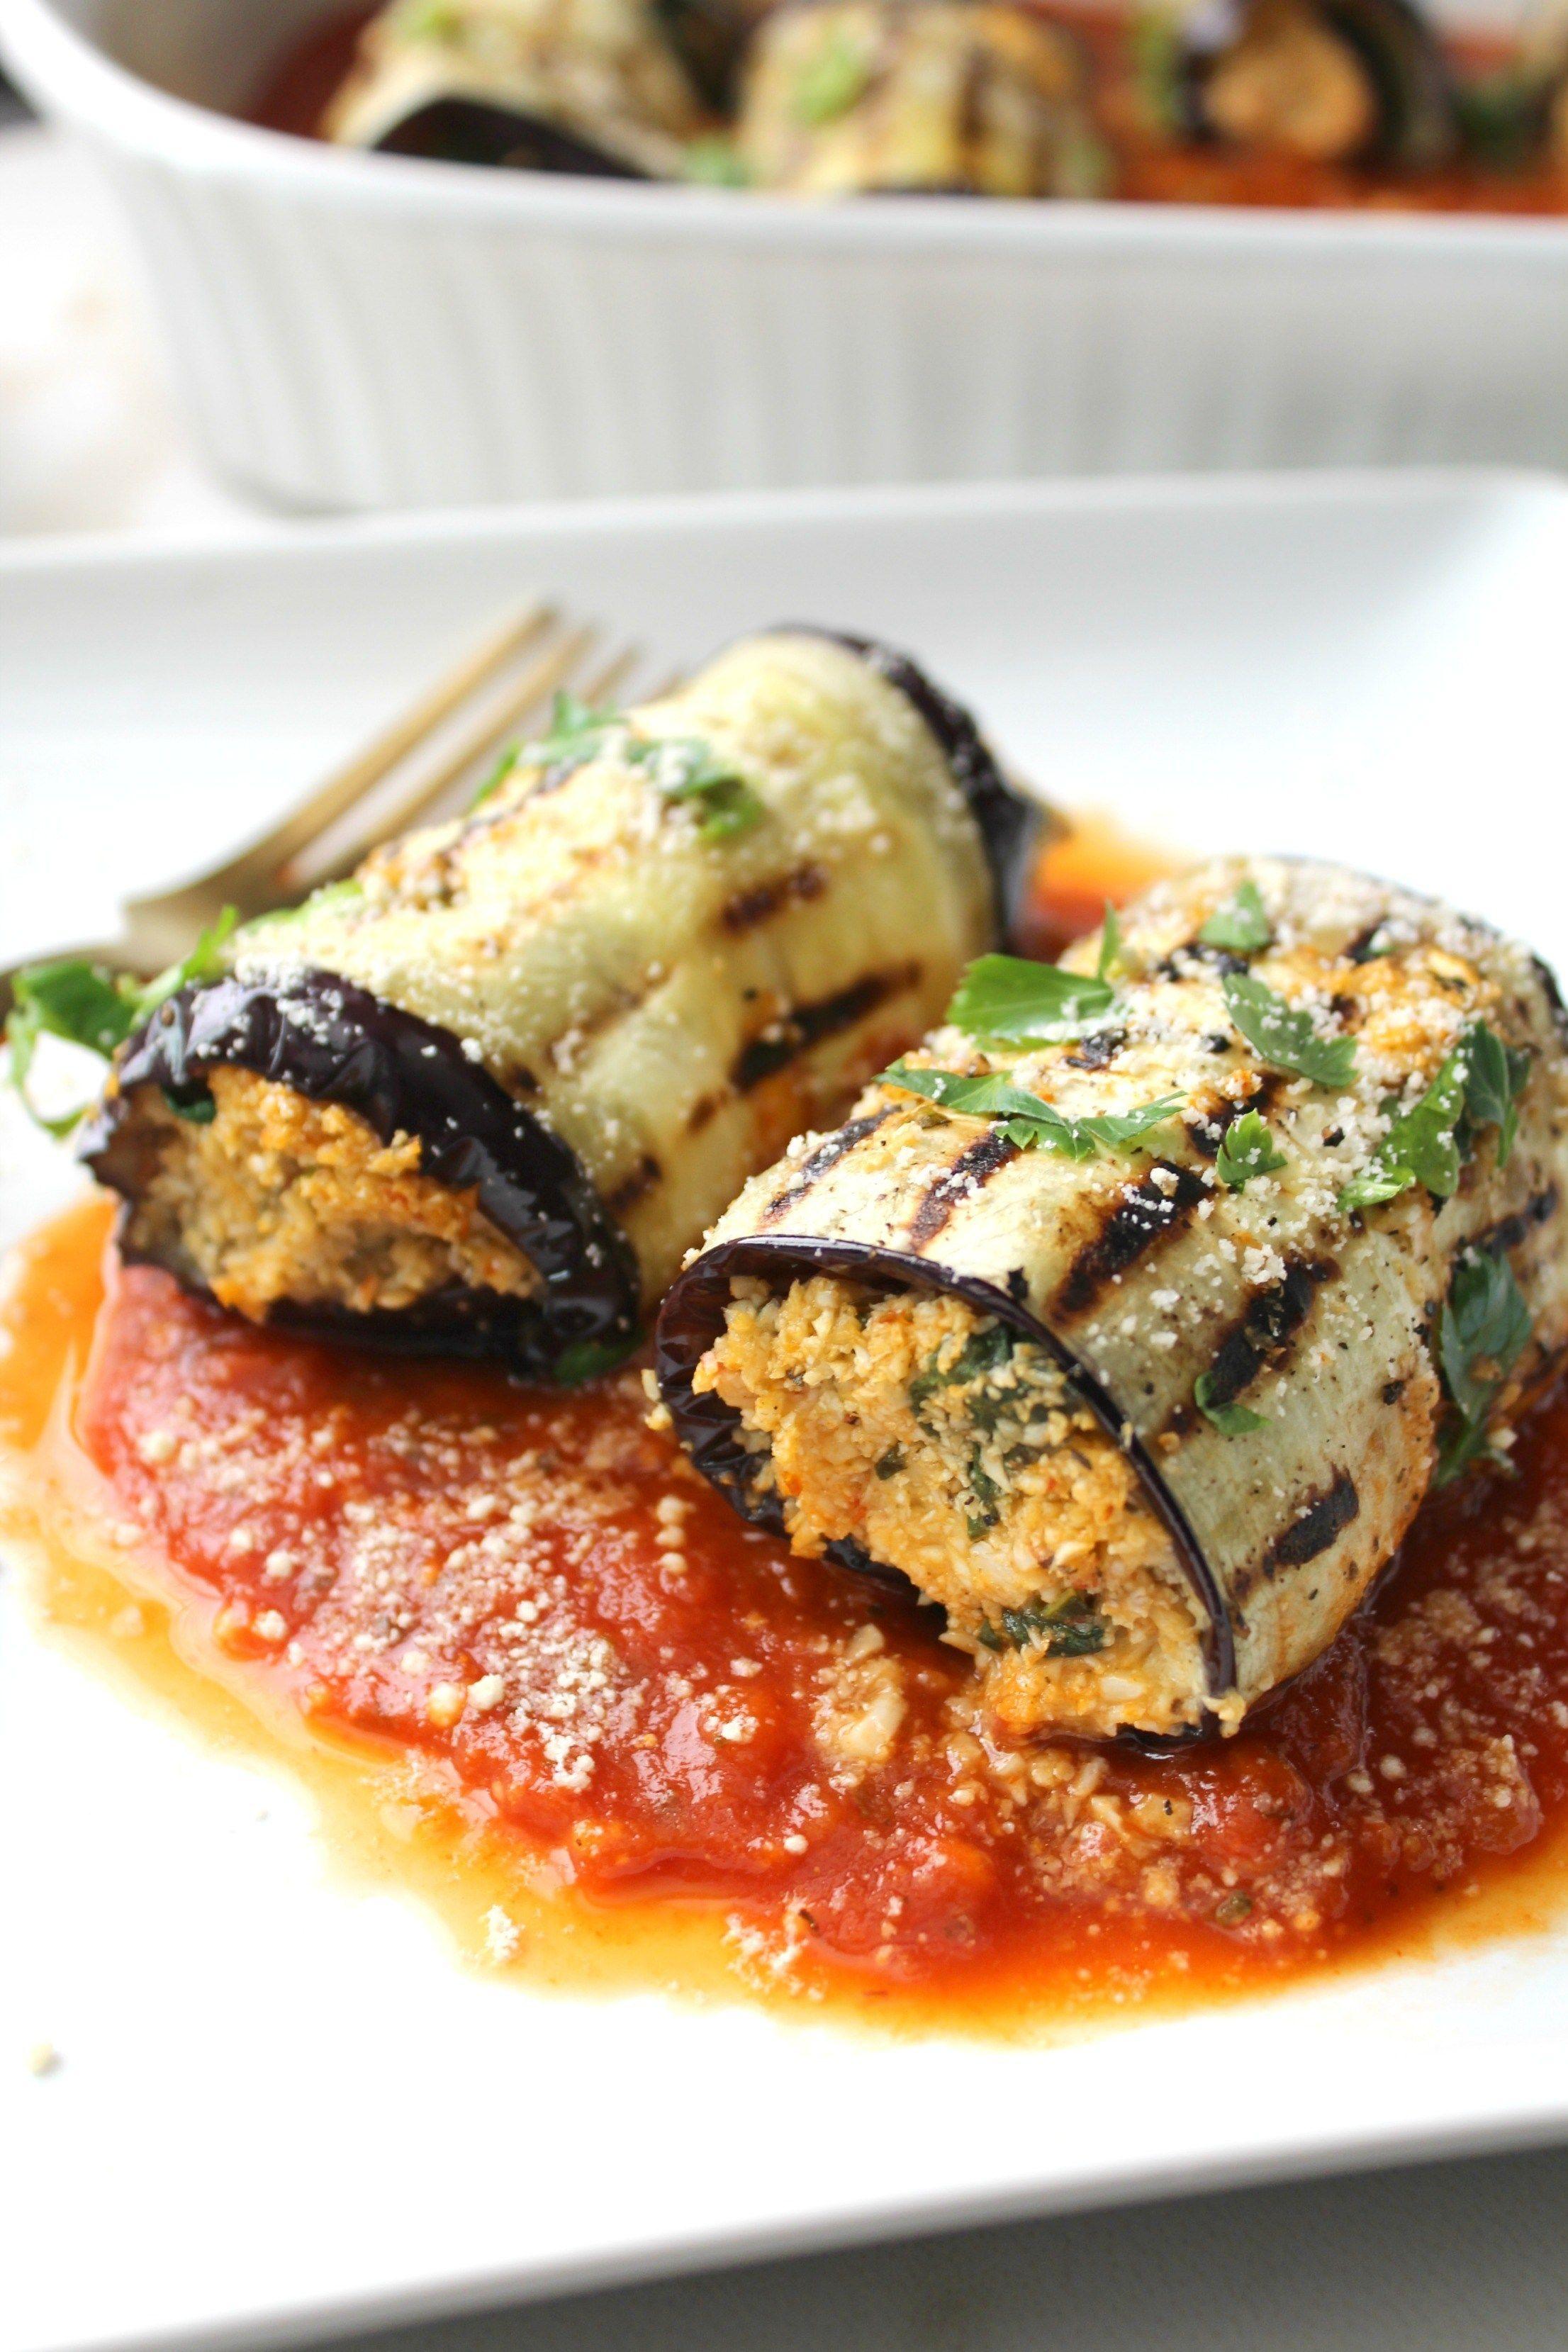 A Light Easy And Fresh Dinner Mediterranean Vegan Eggplant Roll Ups A Combination Of Seasoned Cauliflower Rice Ro Savory Vegan Vegan Dinners Vegan Eggplant